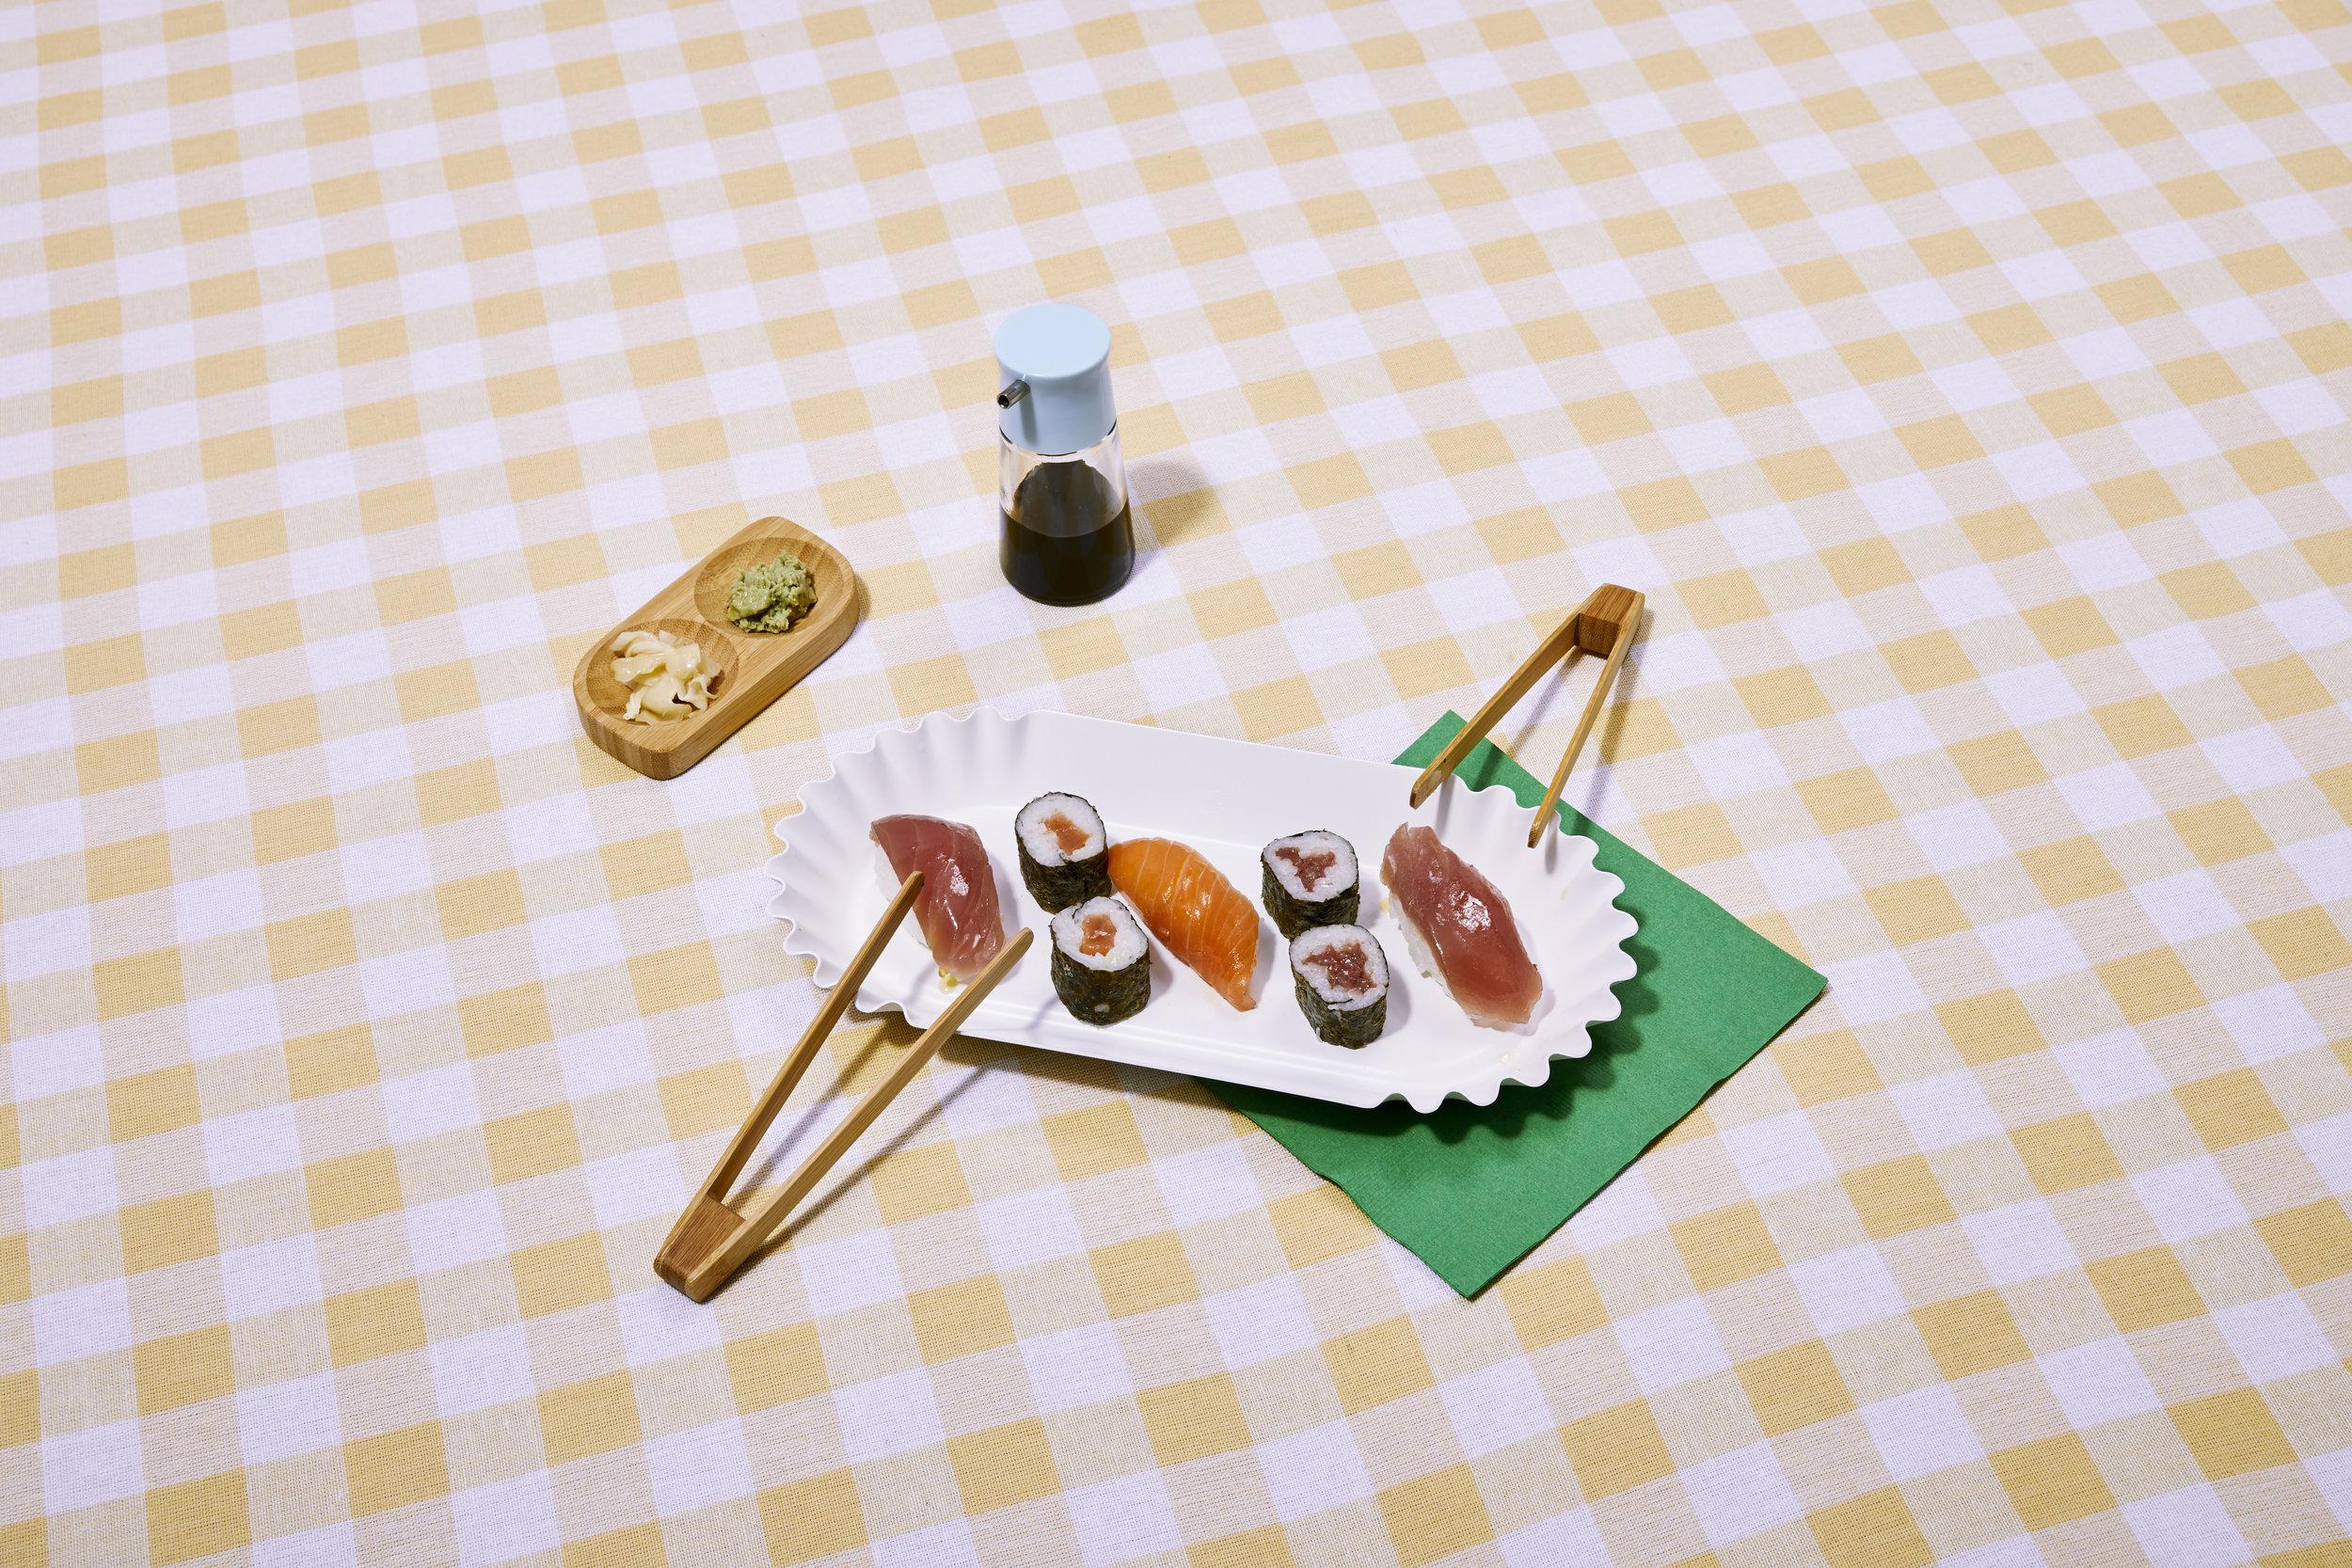 L205c_0518_Sushi_272.jpg